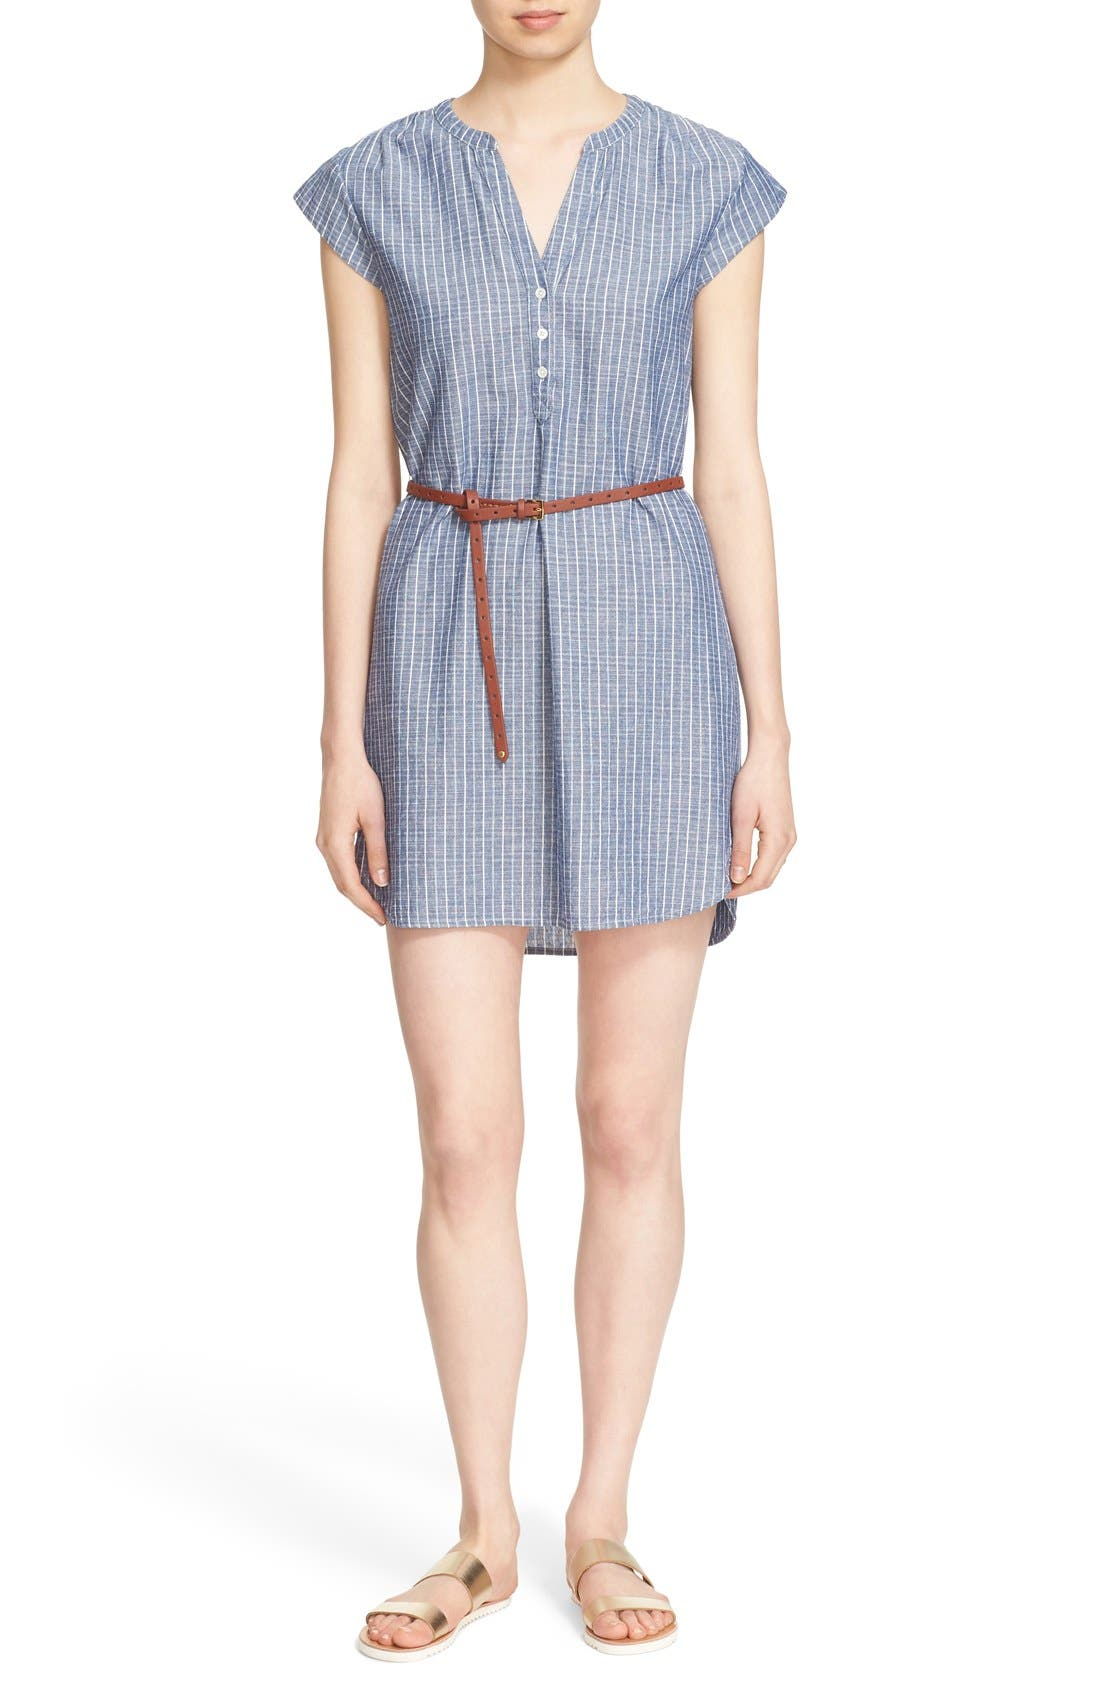 Alternate Image 1 Selected - Joie 'Neha' Belted Cotton Split Neck Shirtdress